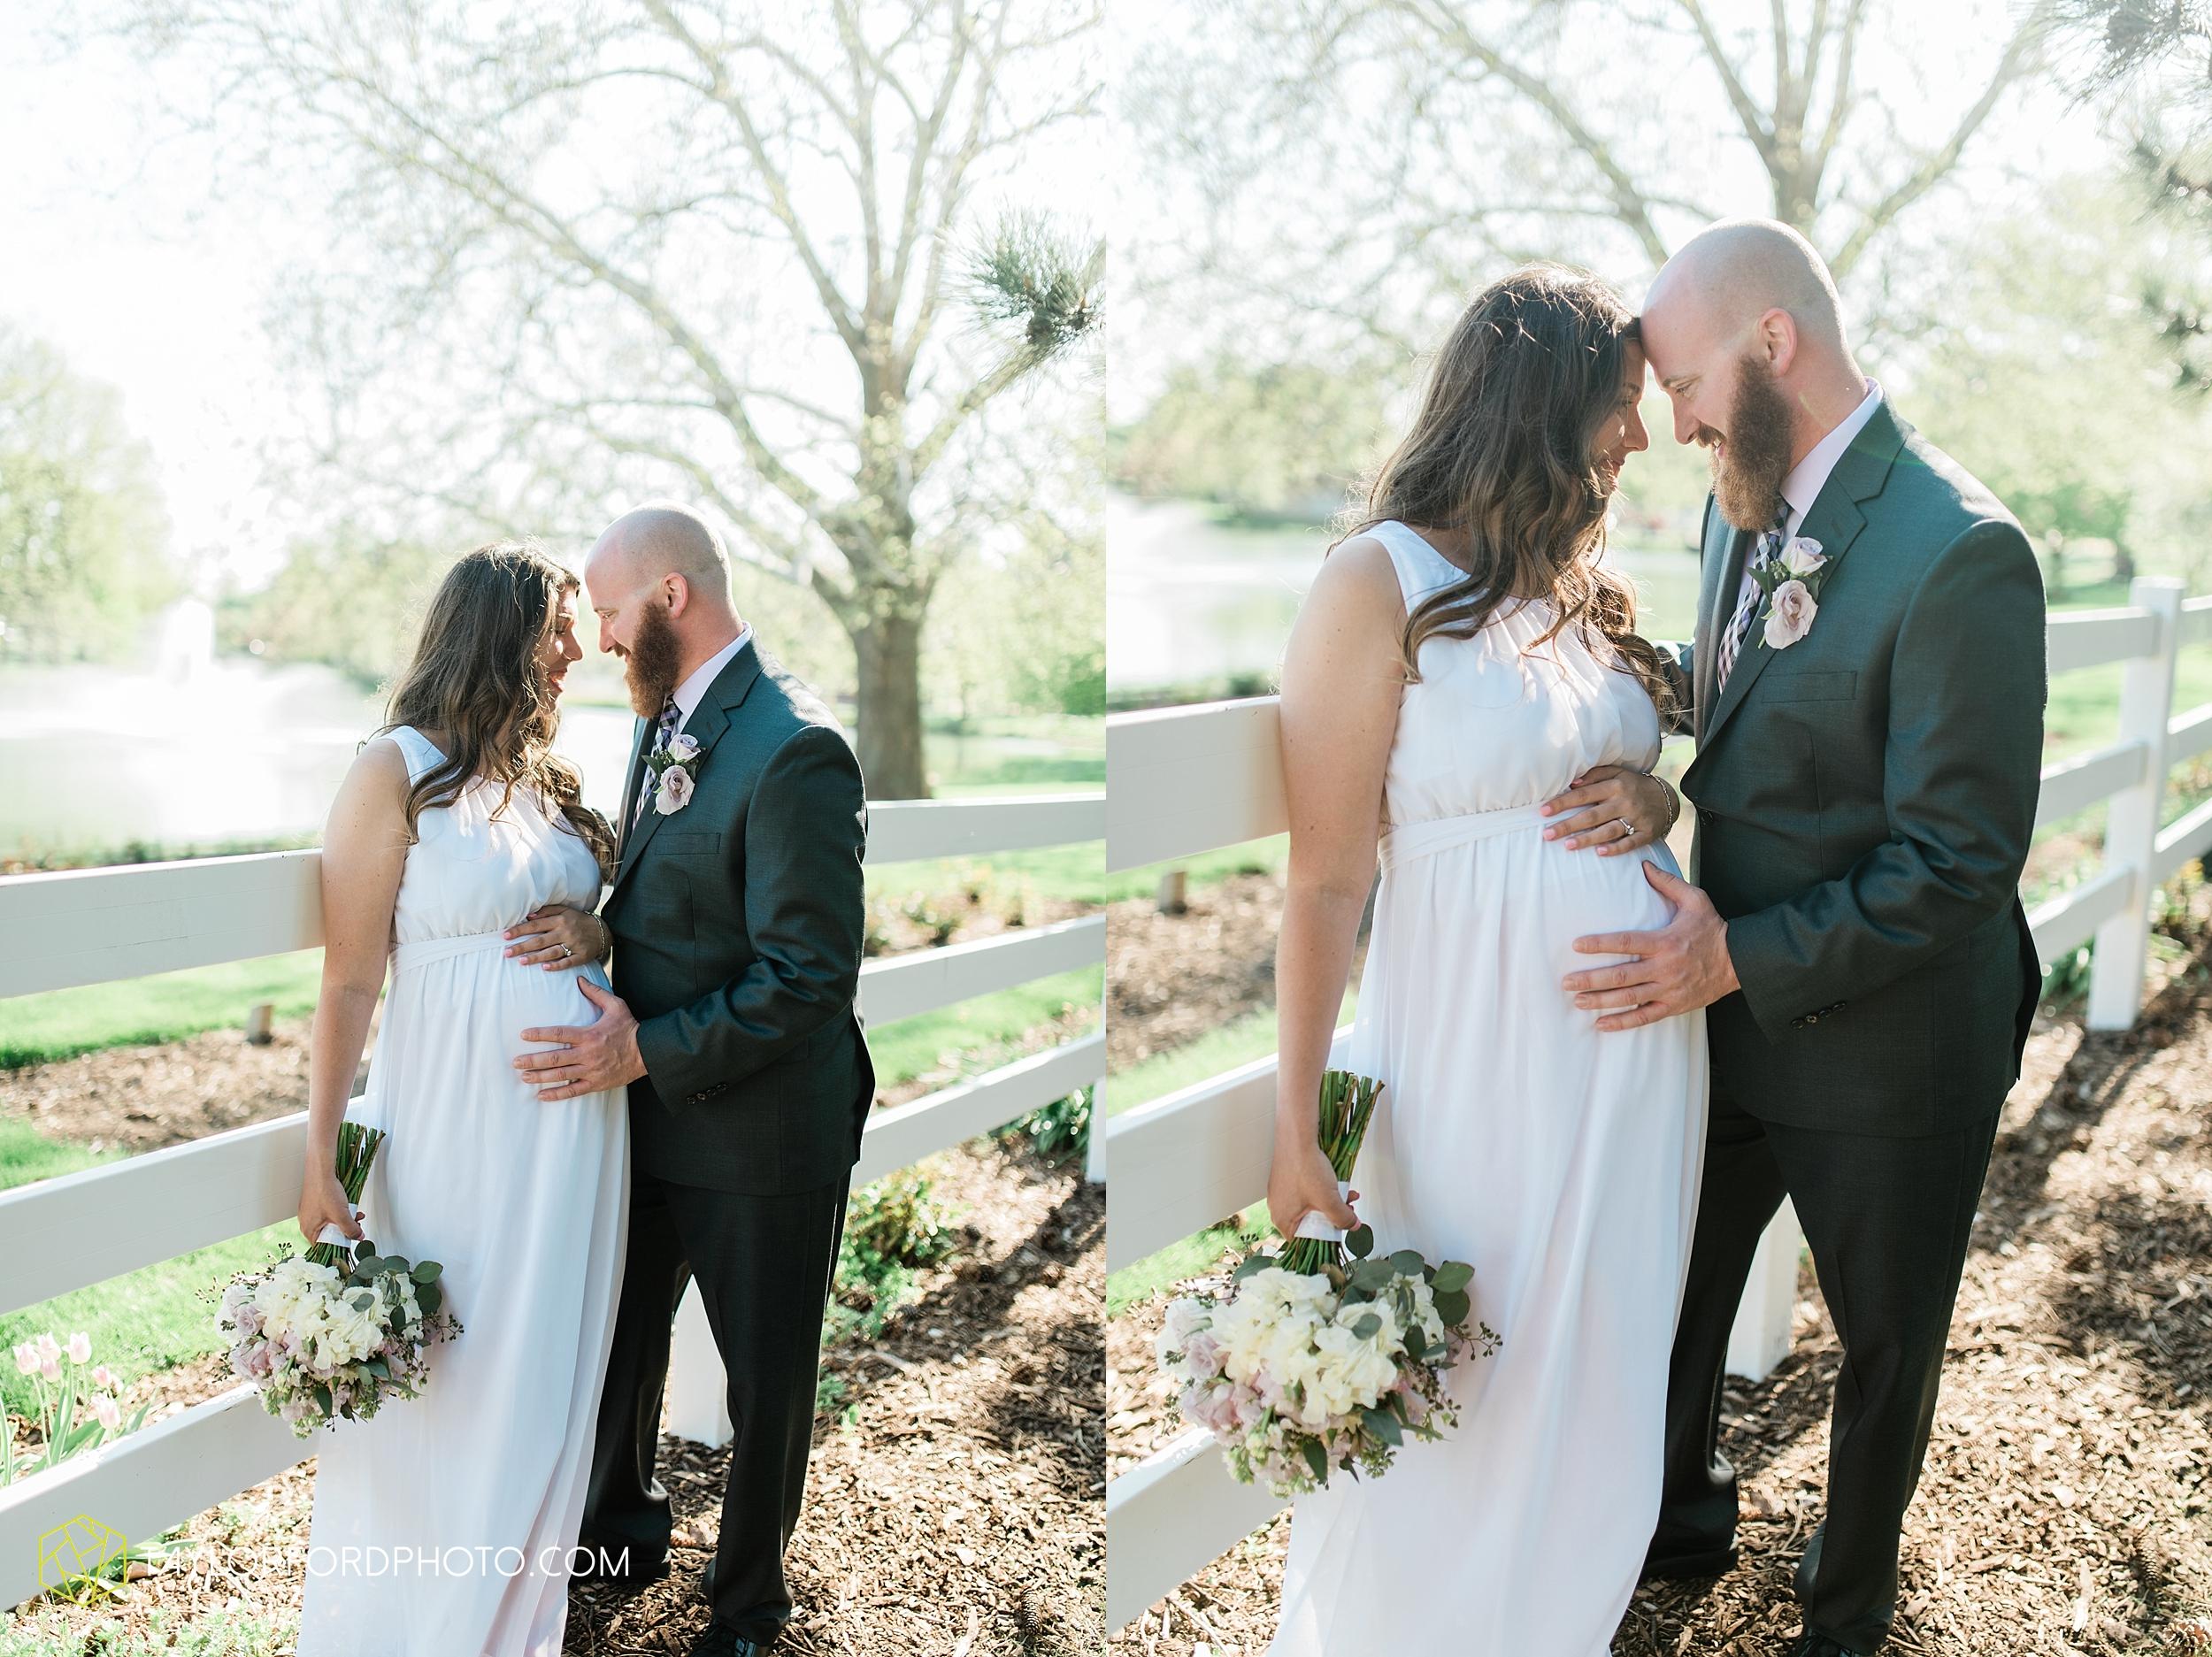 lakeside-rose-gardens-fort-wayne-indiana-elopement-wedding-photographer-Taylor-Ford-Photography_7181.jpg